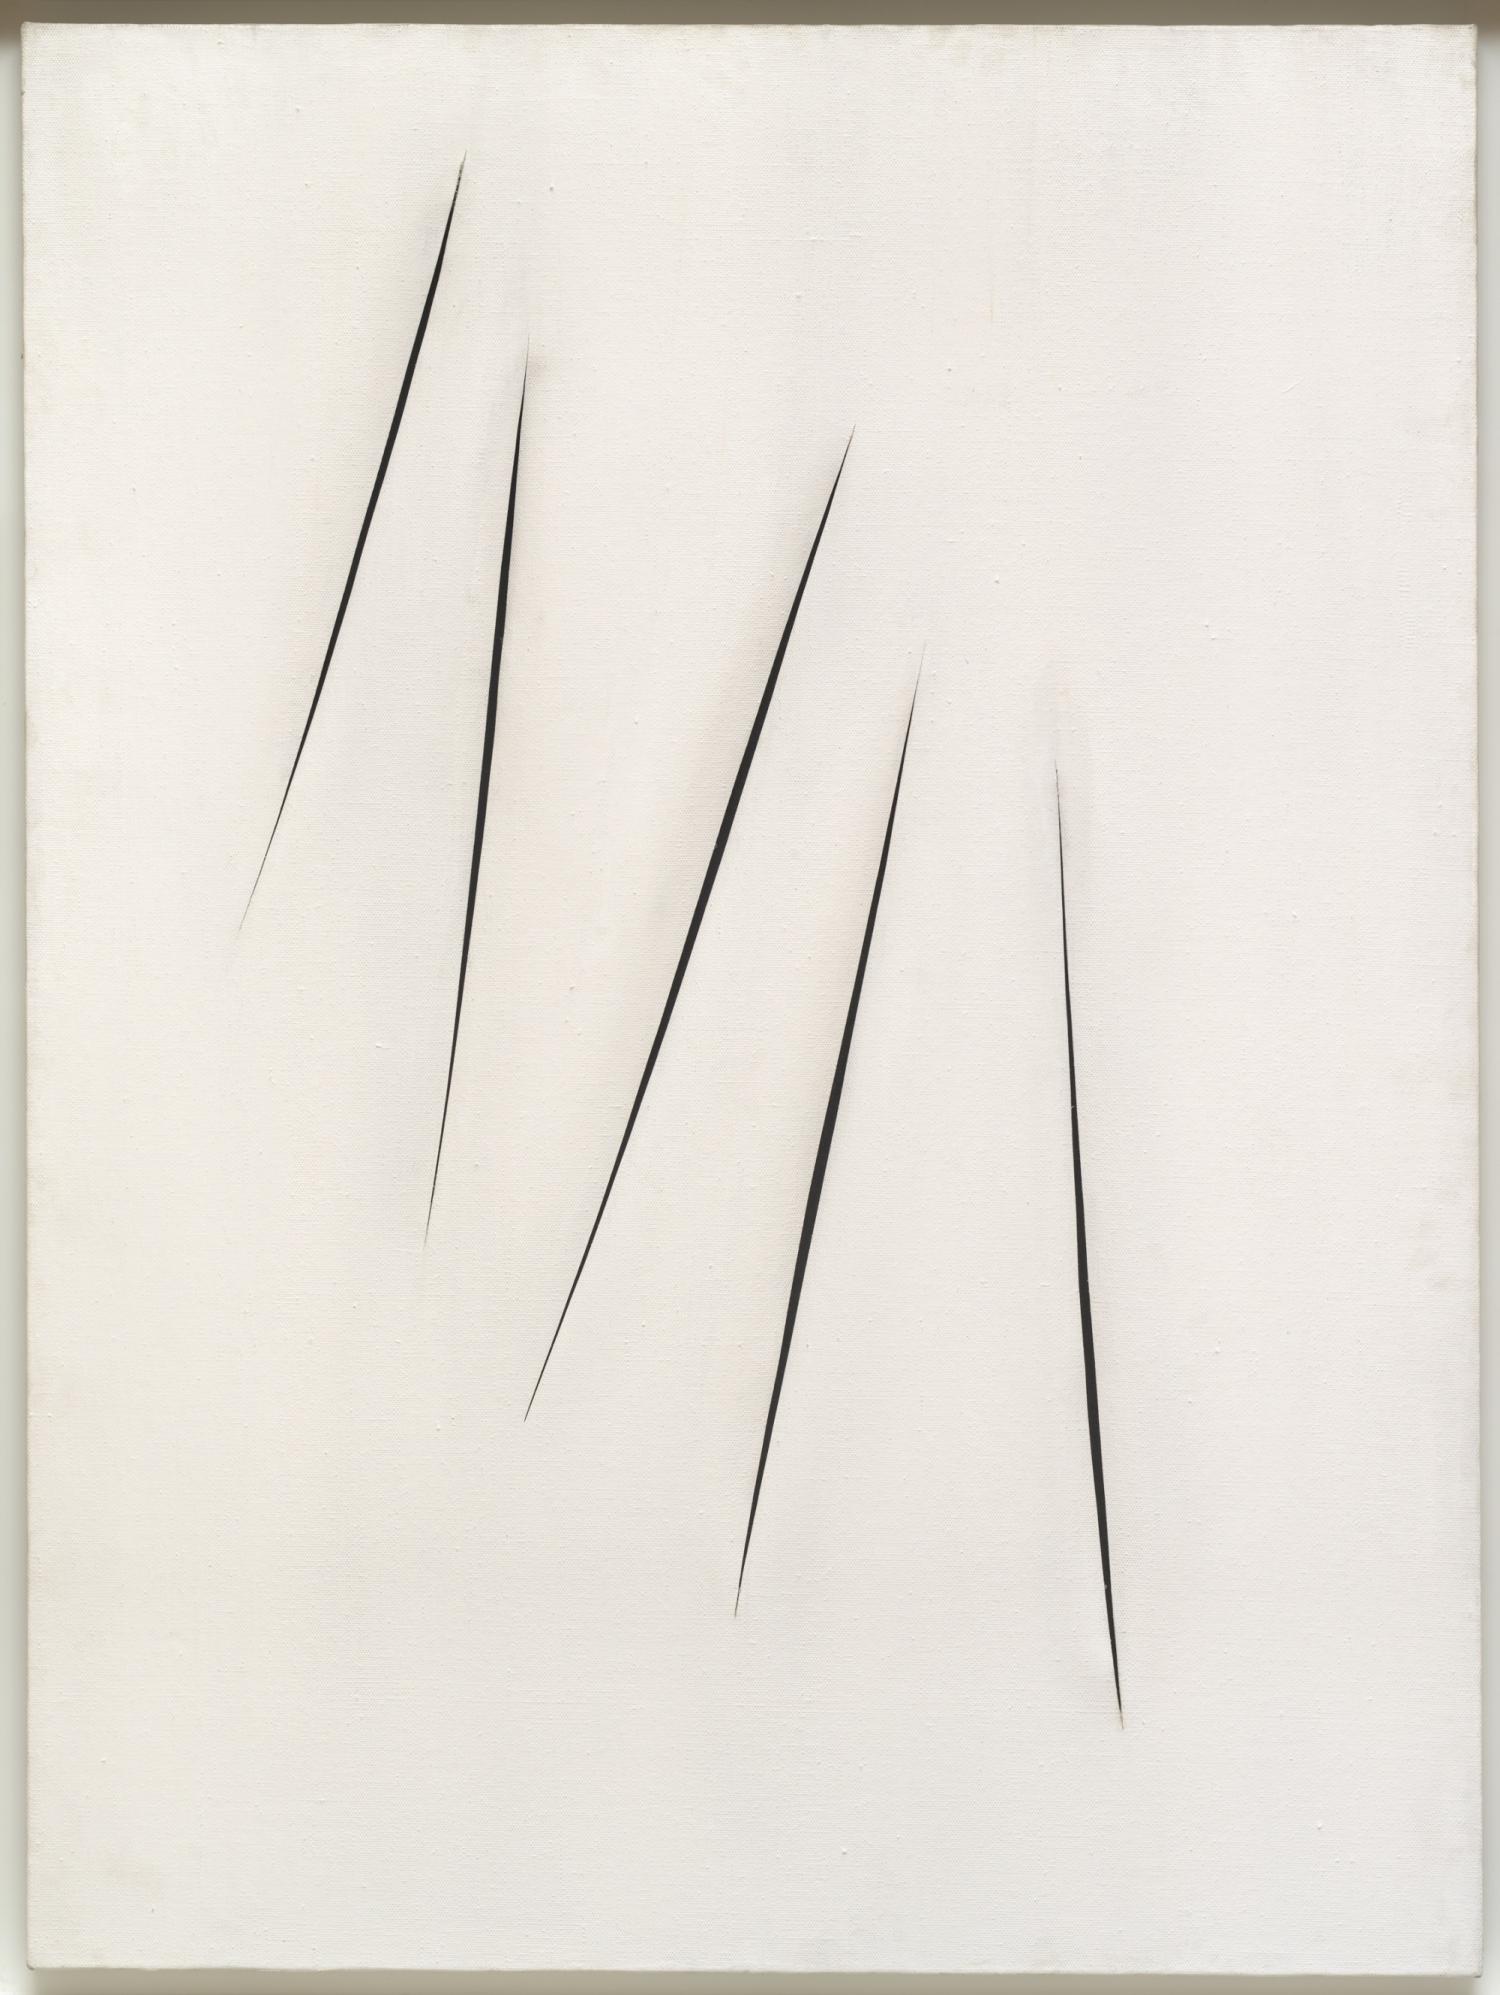 Lucio Fontana (Rosario di Santa Fe 1899-Varese 1968) Concetto spaziale, Attese, 1965